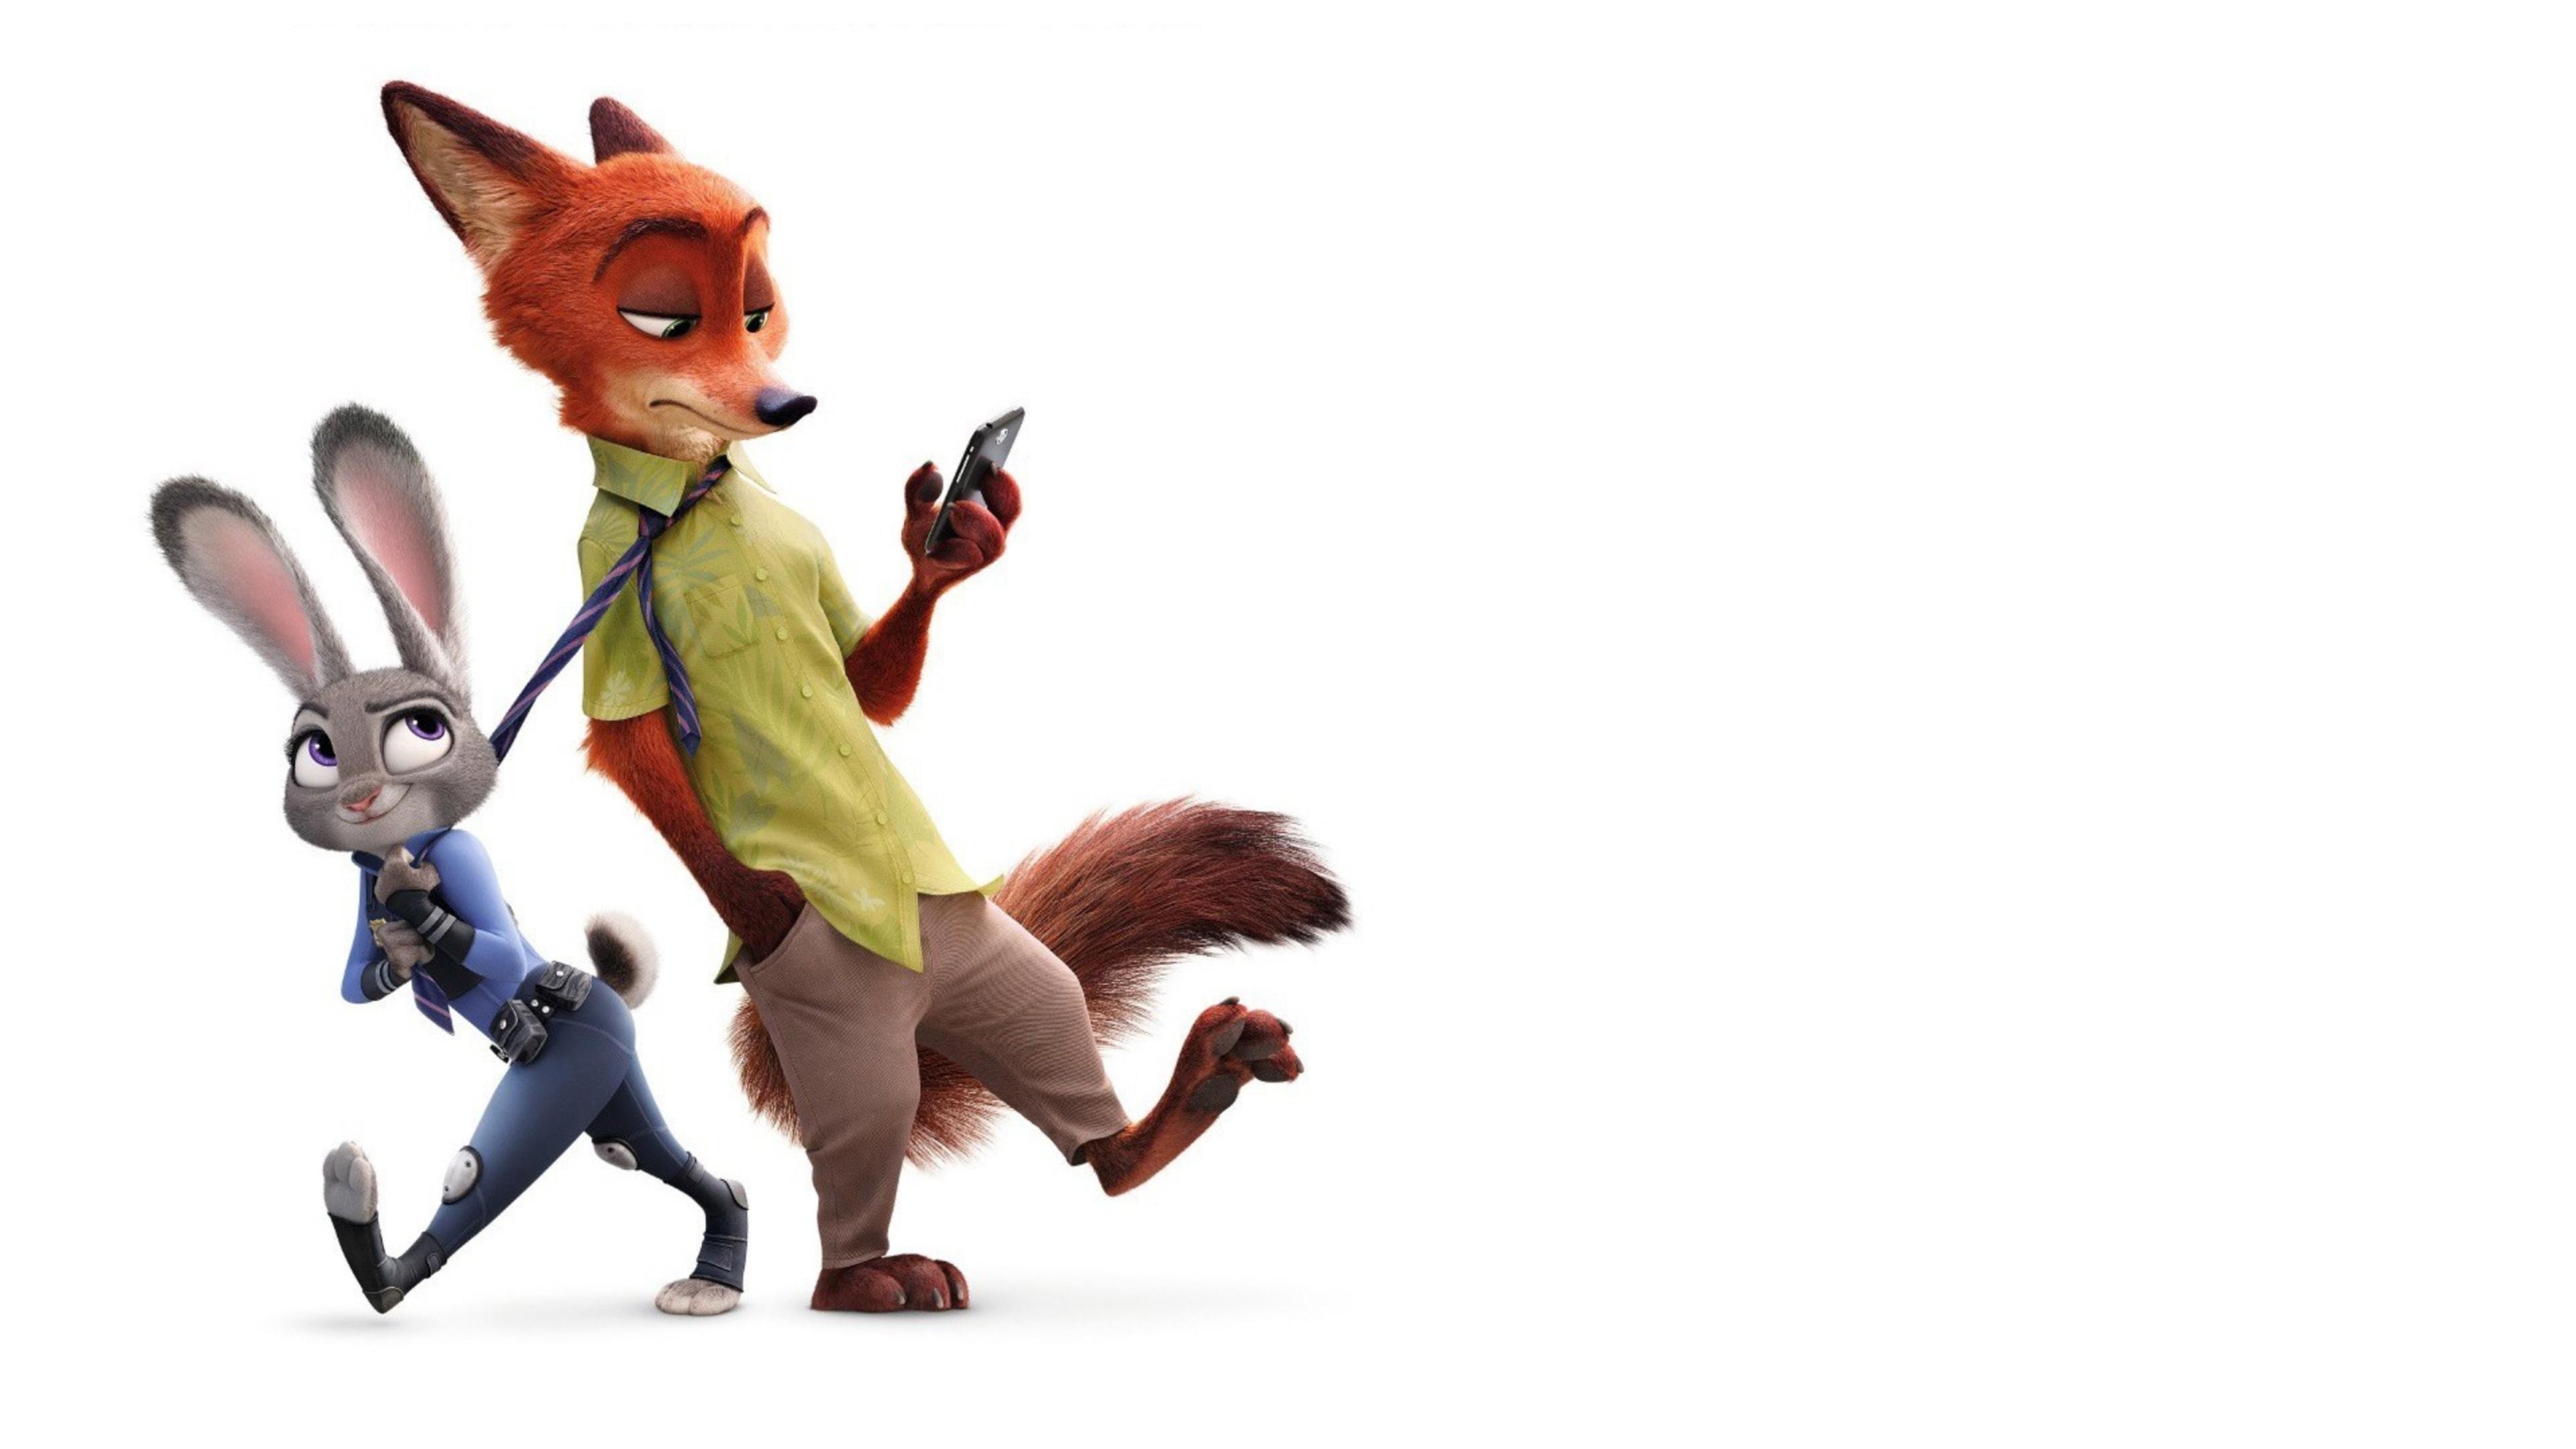 Best Wallpaper Movie Animated - zootopia-movie-latest  2018_467382.jpg